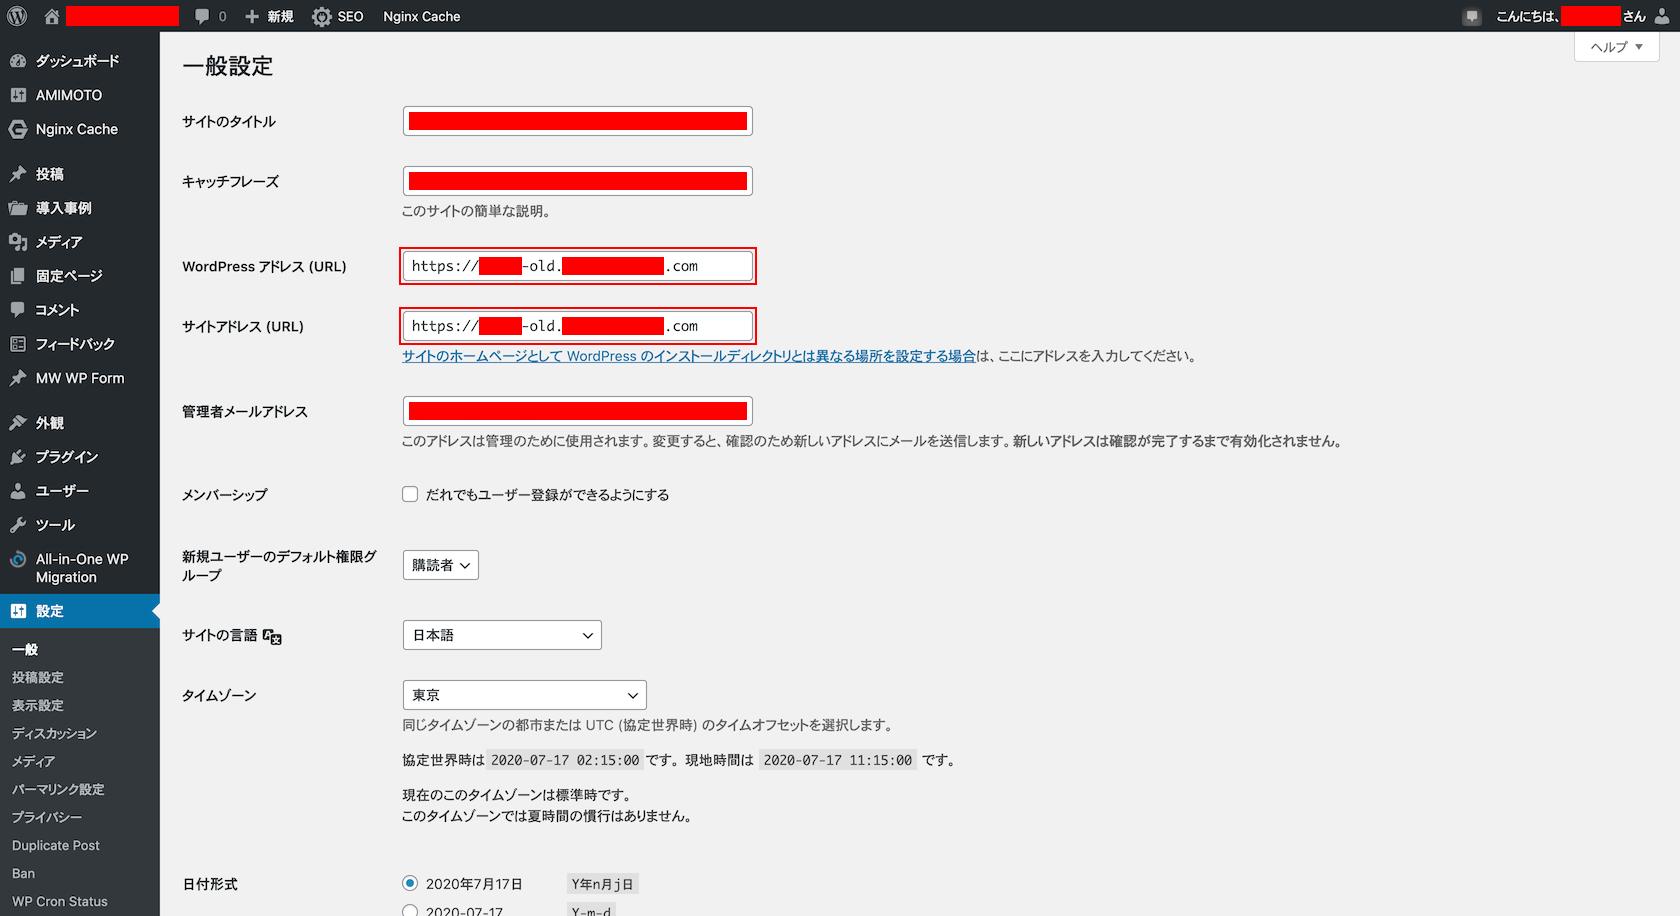 FireShot Capture 444 - 一般設定 ‹ 現場クラウド Conne — WordPress - conne-old.genbasupport.com.png